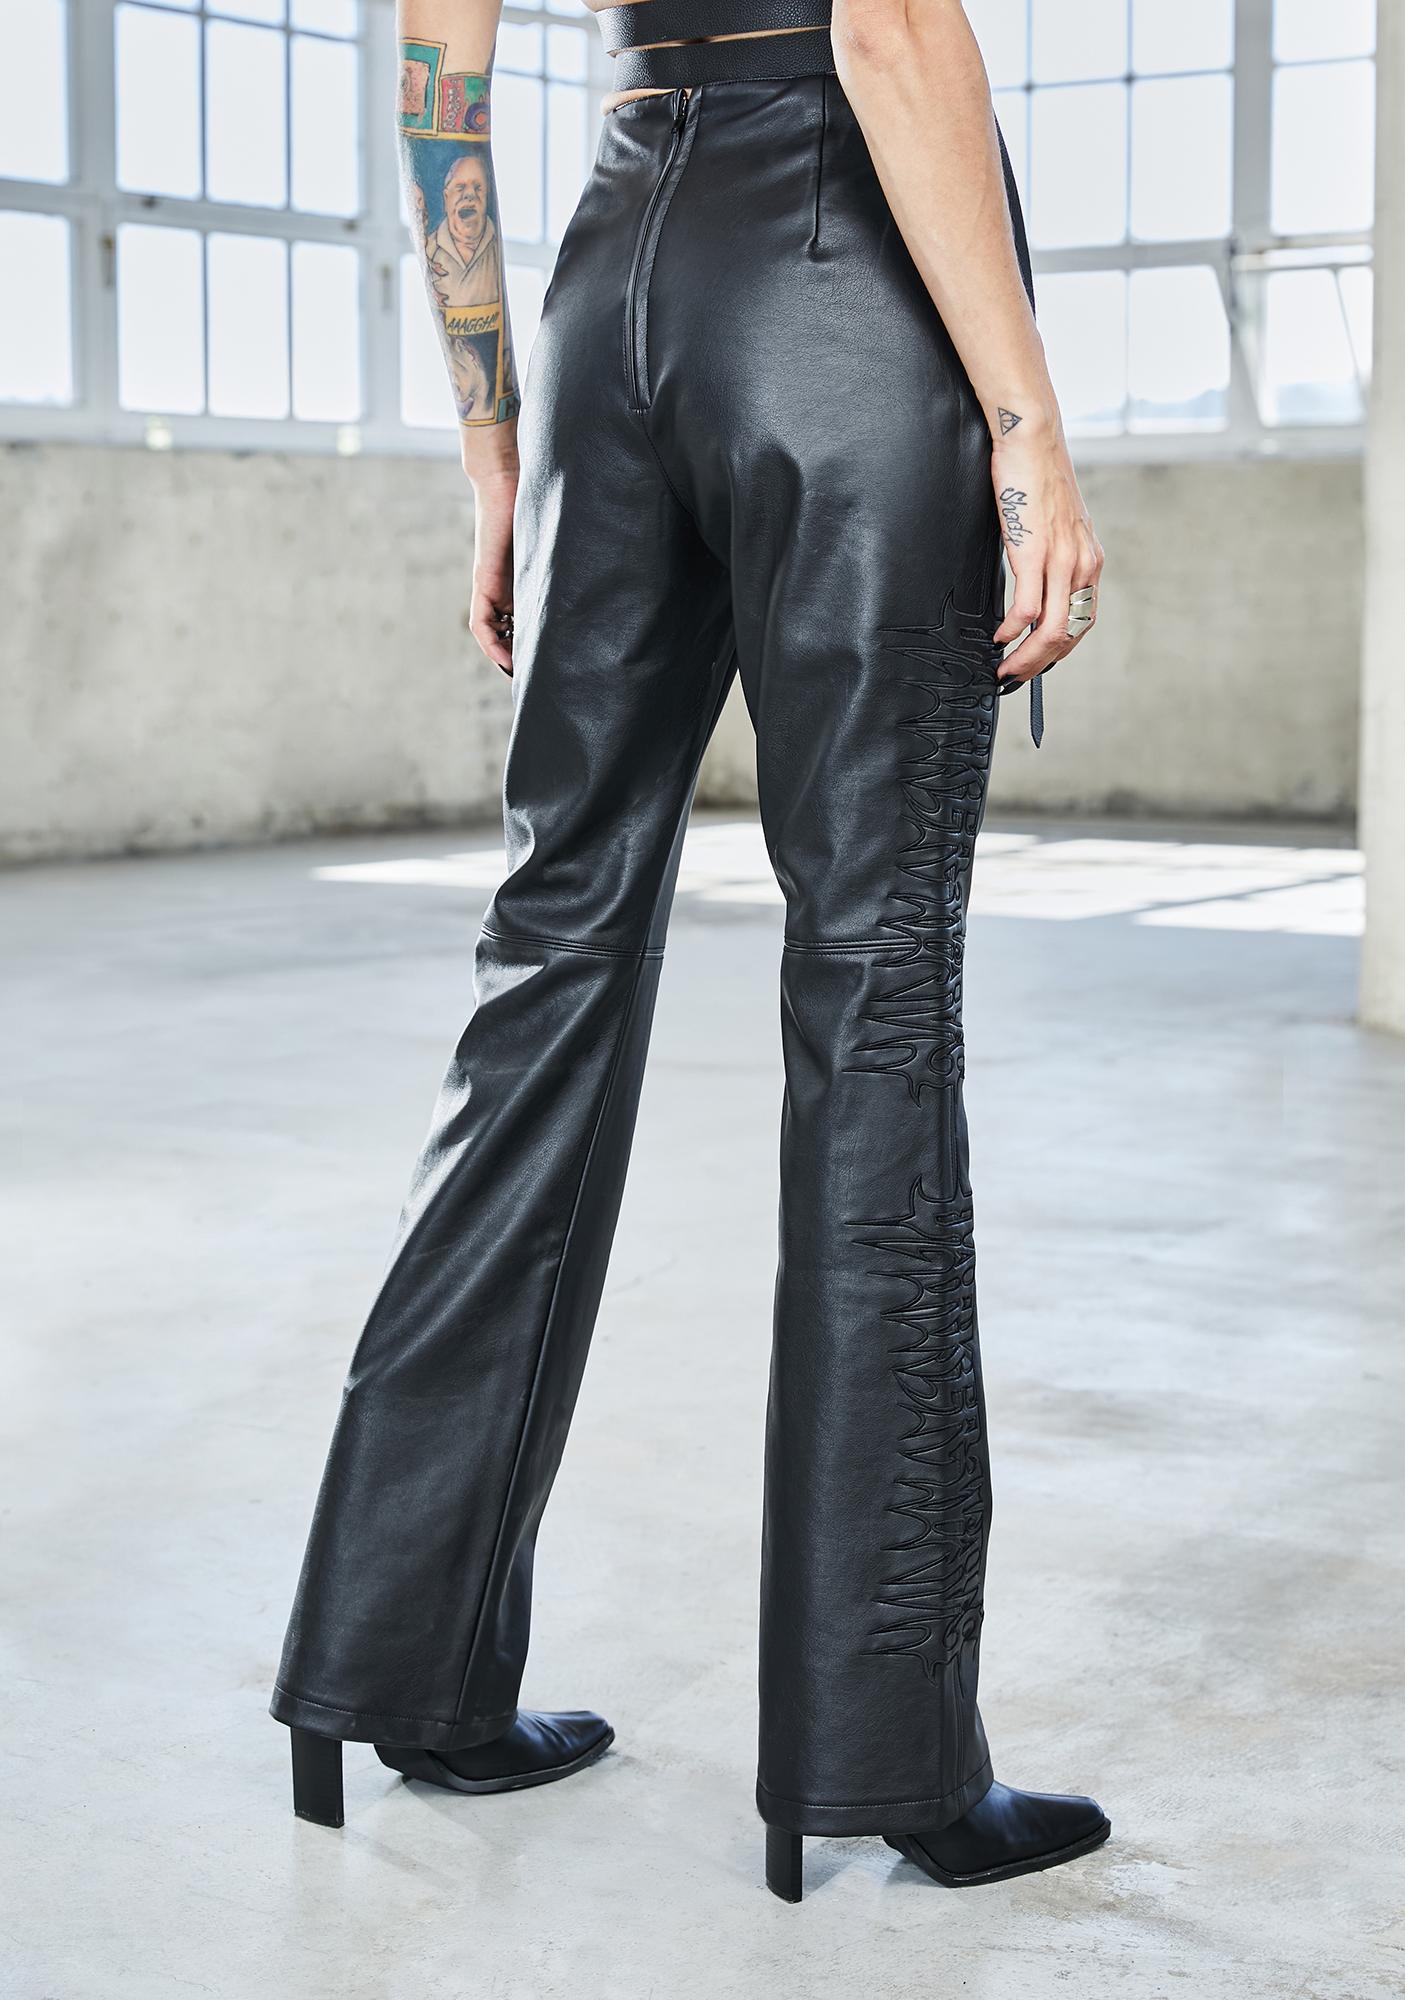 DARKER WAVS Bassline Vegan Leather Lace Up Pants